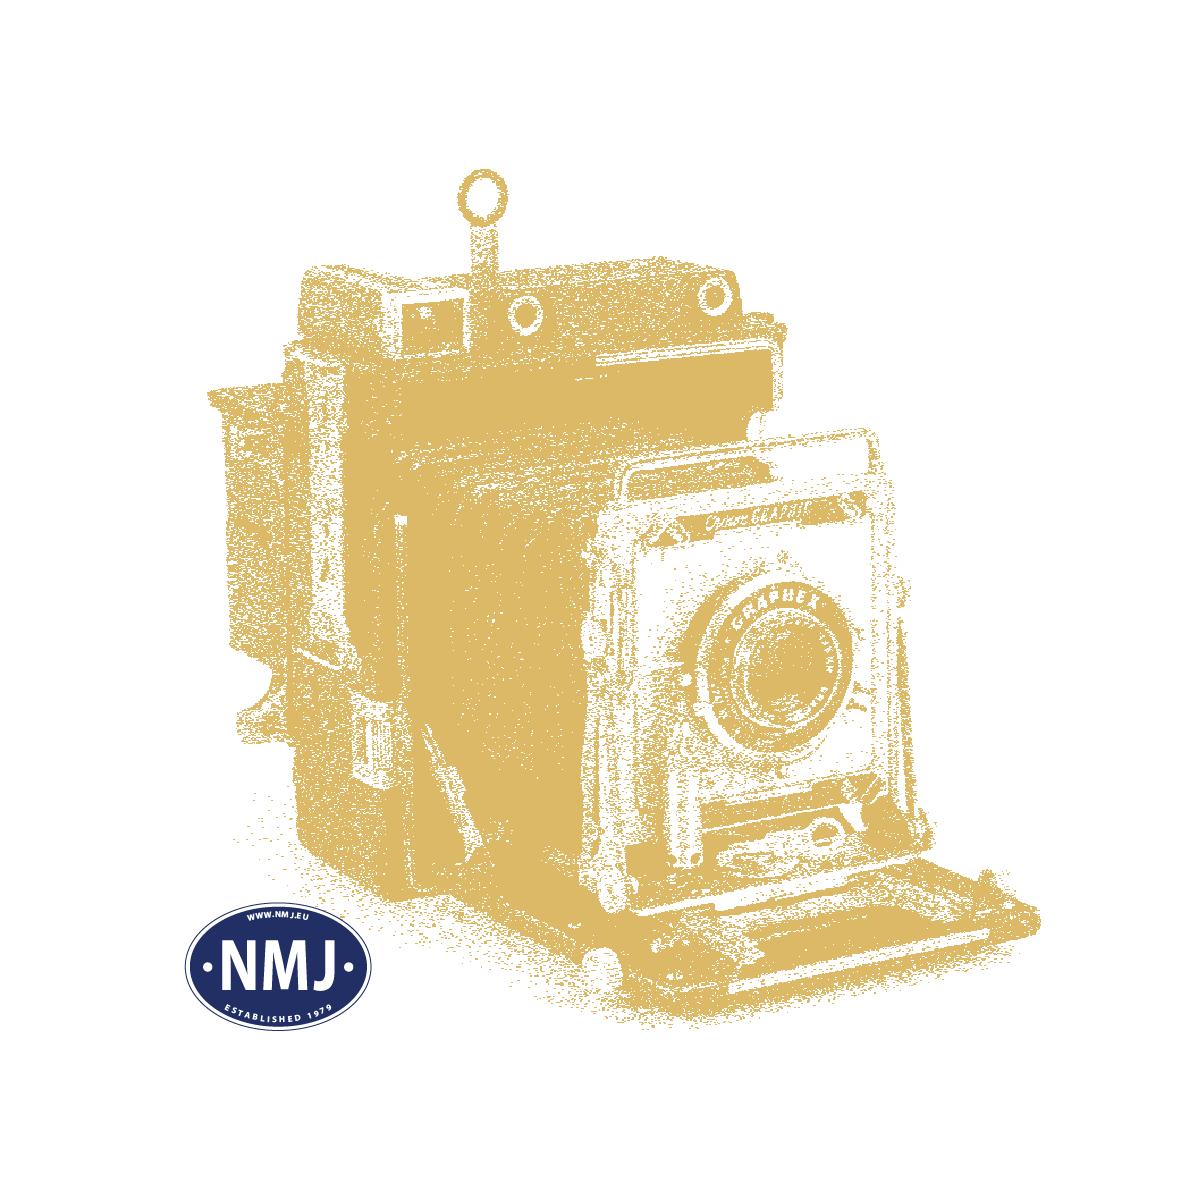 NMJT85.102AC - NMJ Topline NSB Di8.710, AC analog